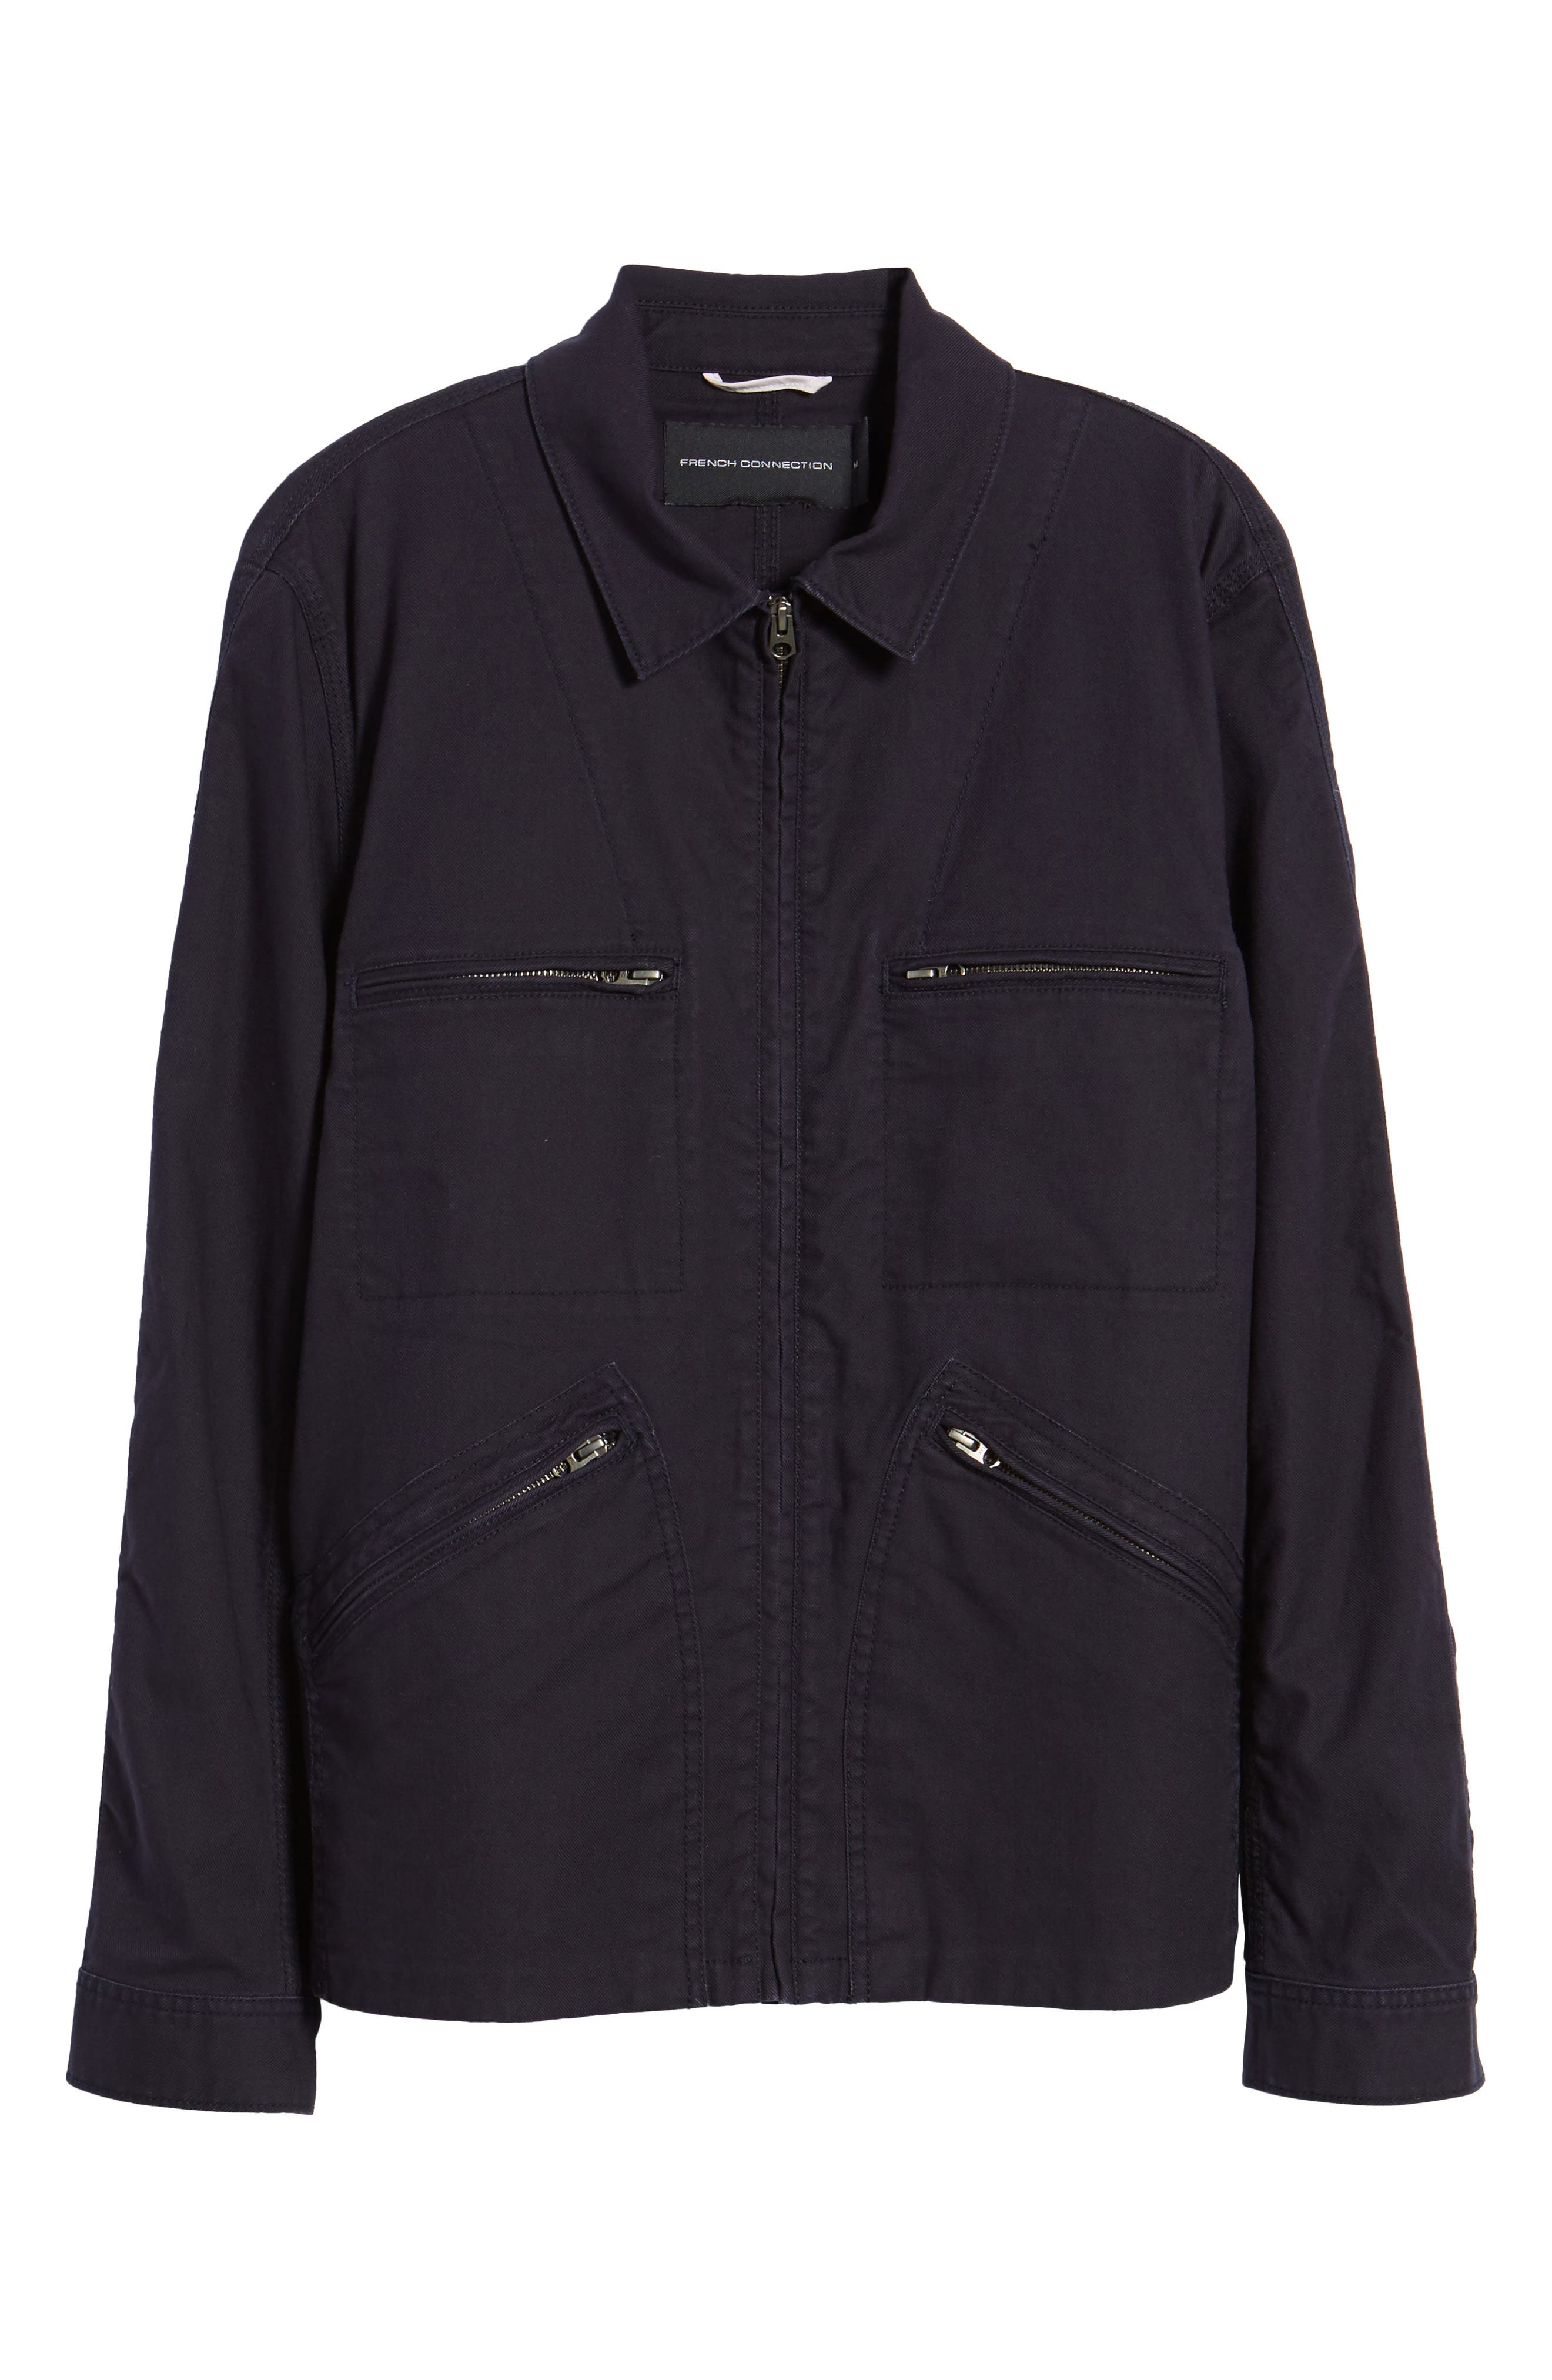 Slim Fit Slub Twill Cotton & Linen Jacket,                             Alternate thumbnail 5, color,                             001